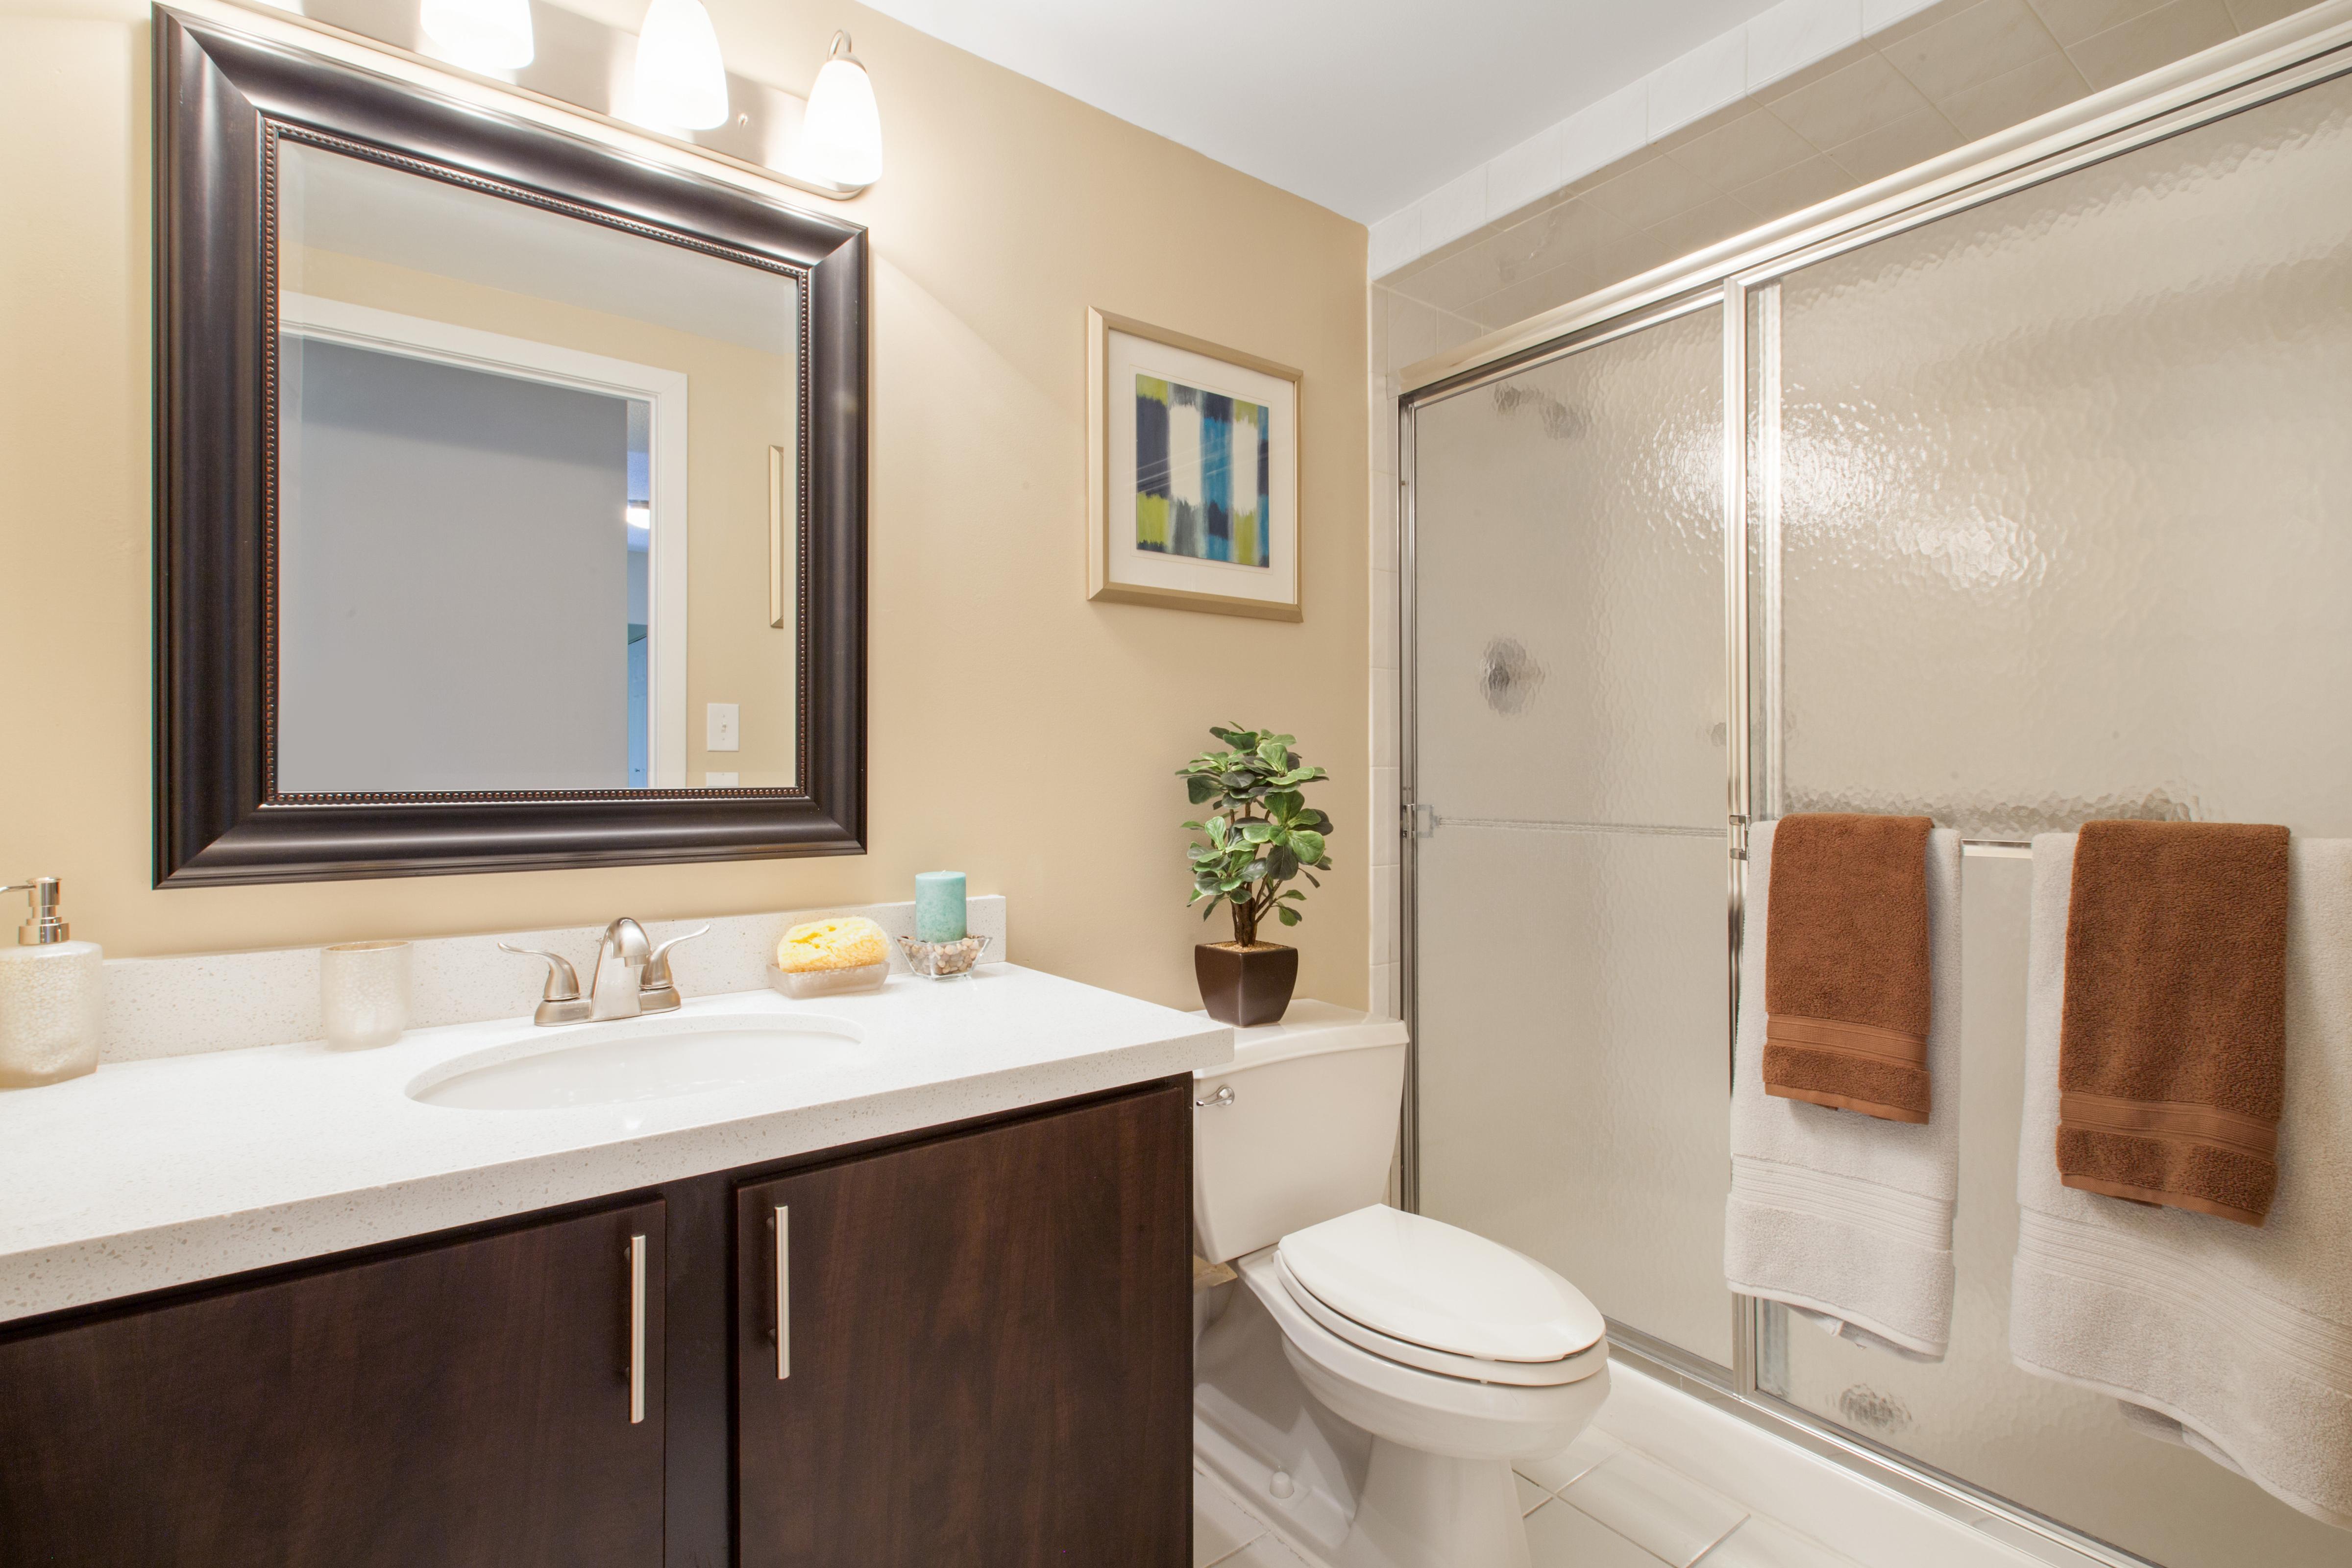 Prospect Place Apartments Bathroom